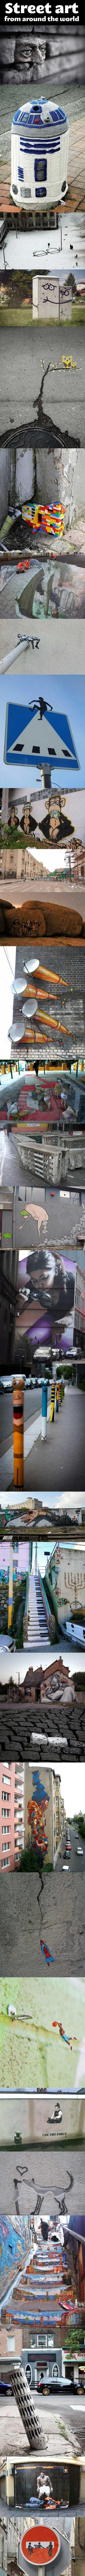 Street art from around the world.